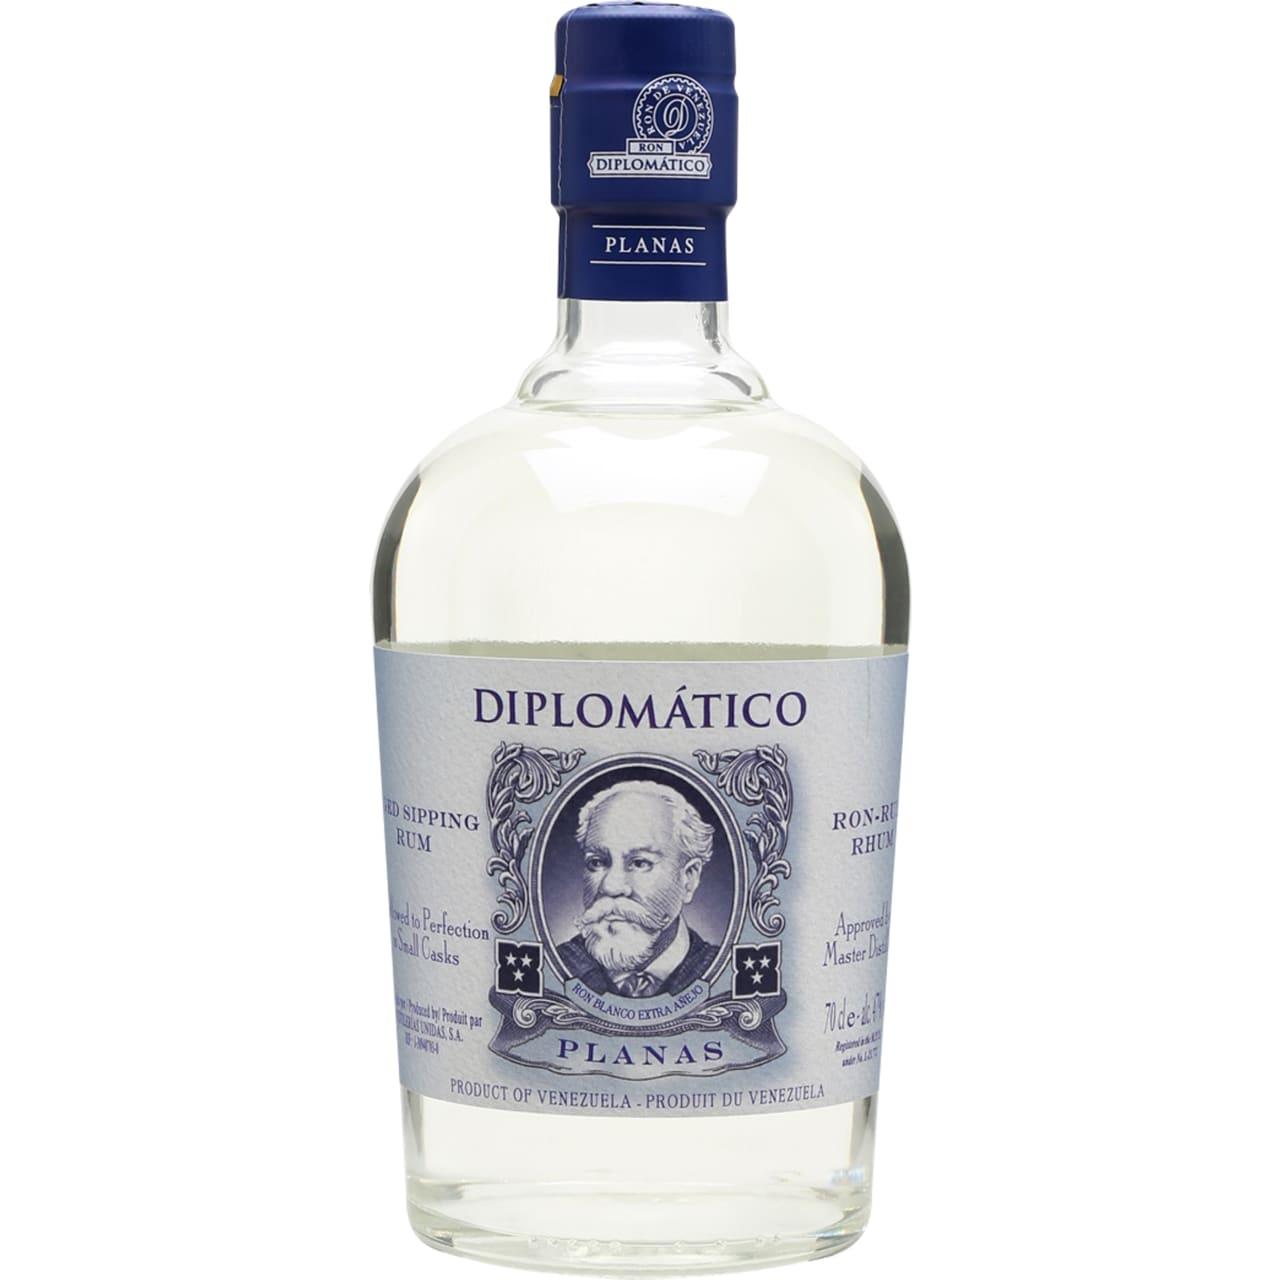 Product Image - Diplomatico Planas Rum